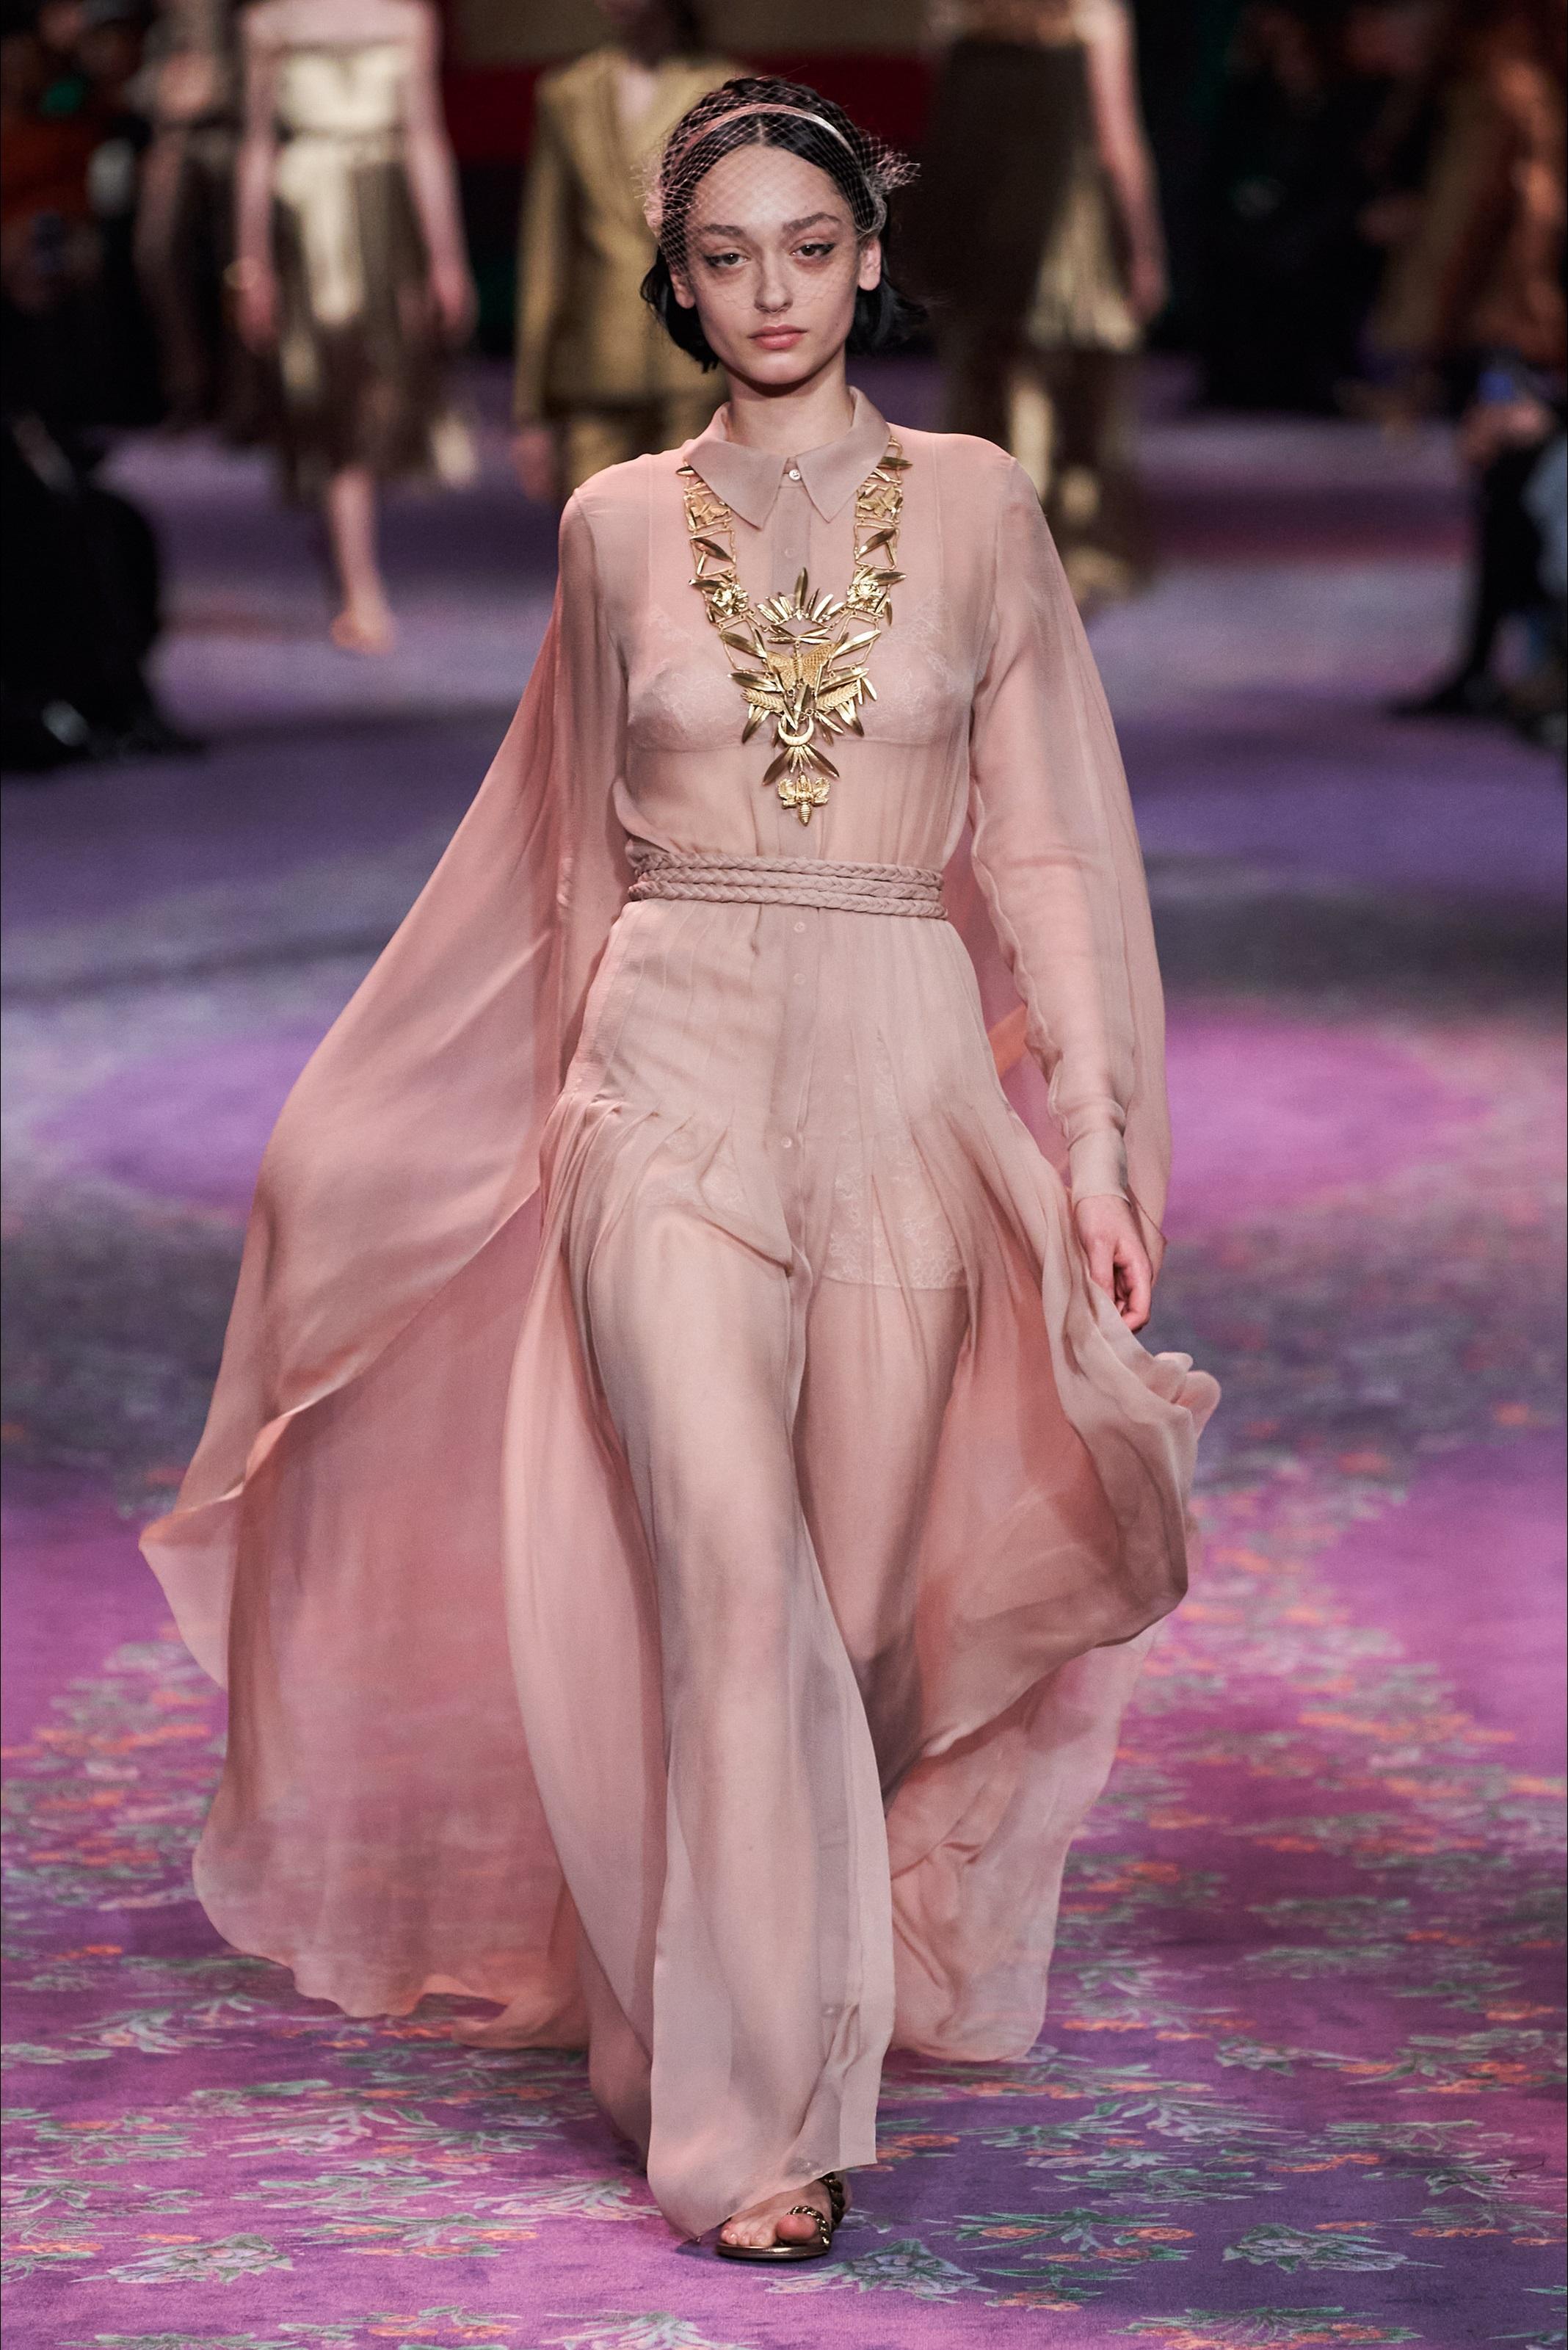 Sfilata Dior 2020 - Neomag.